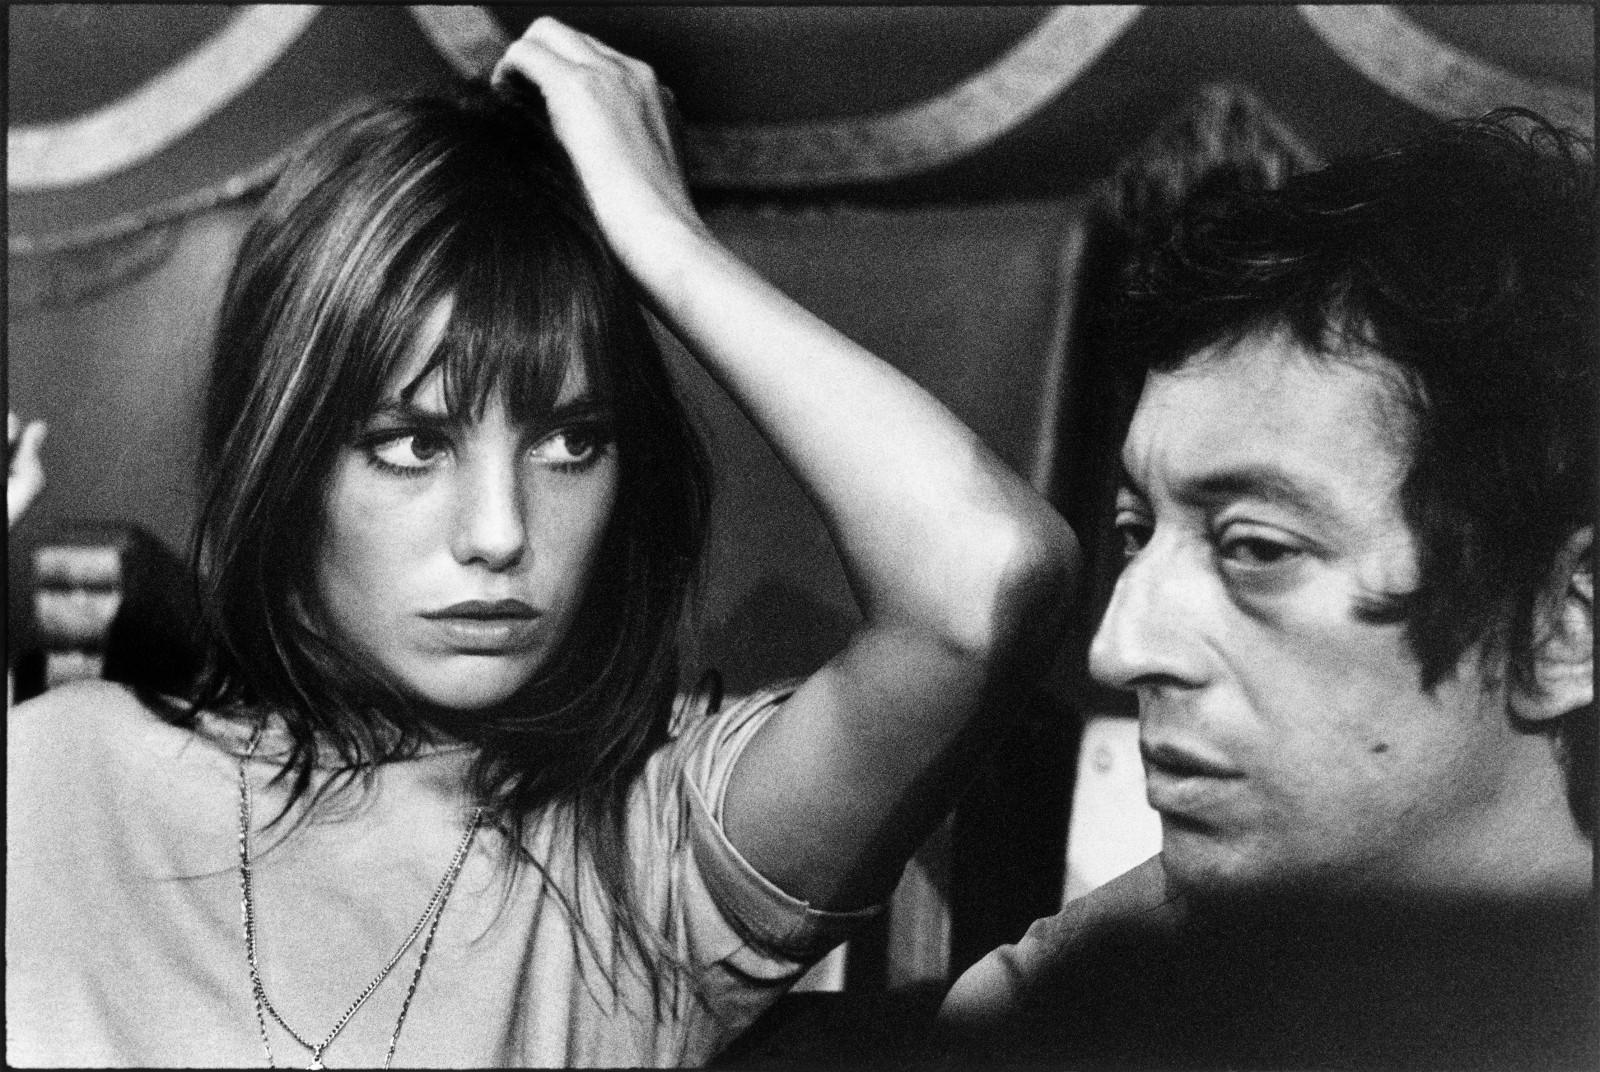 Serge Gainsbourg Jane Birkin Paris, 1969 © Tony Frank